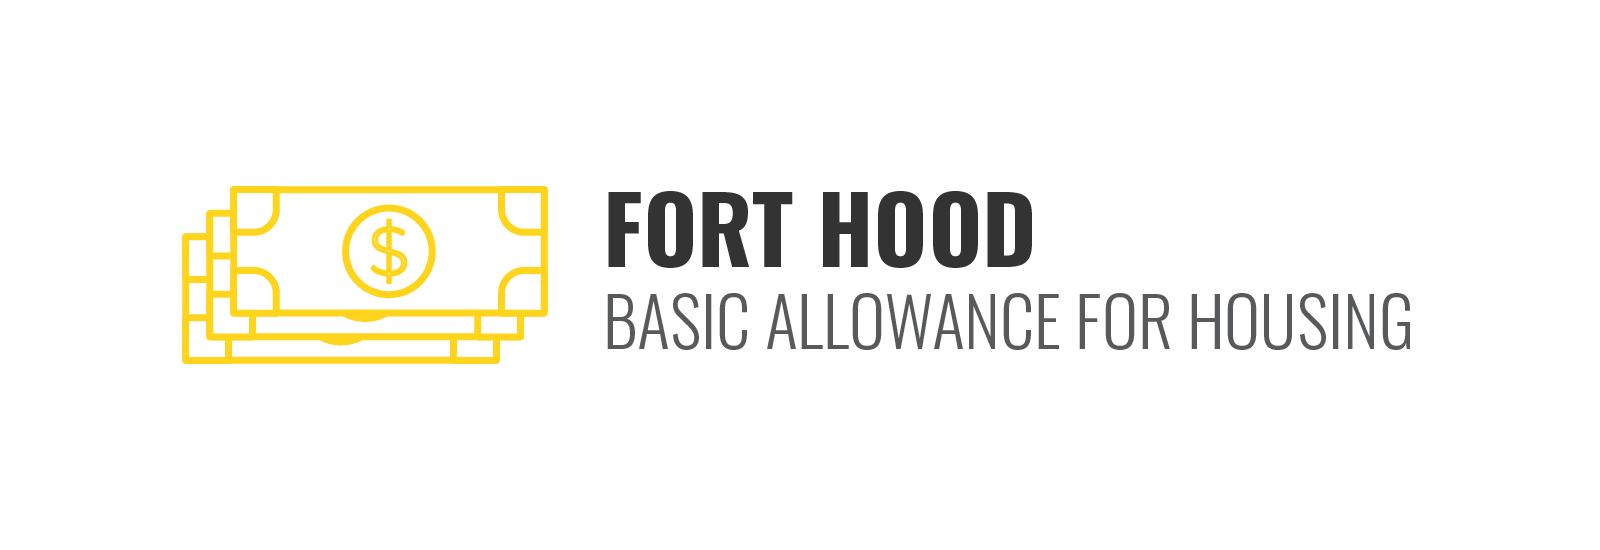 Fort Hood Basic Allowance